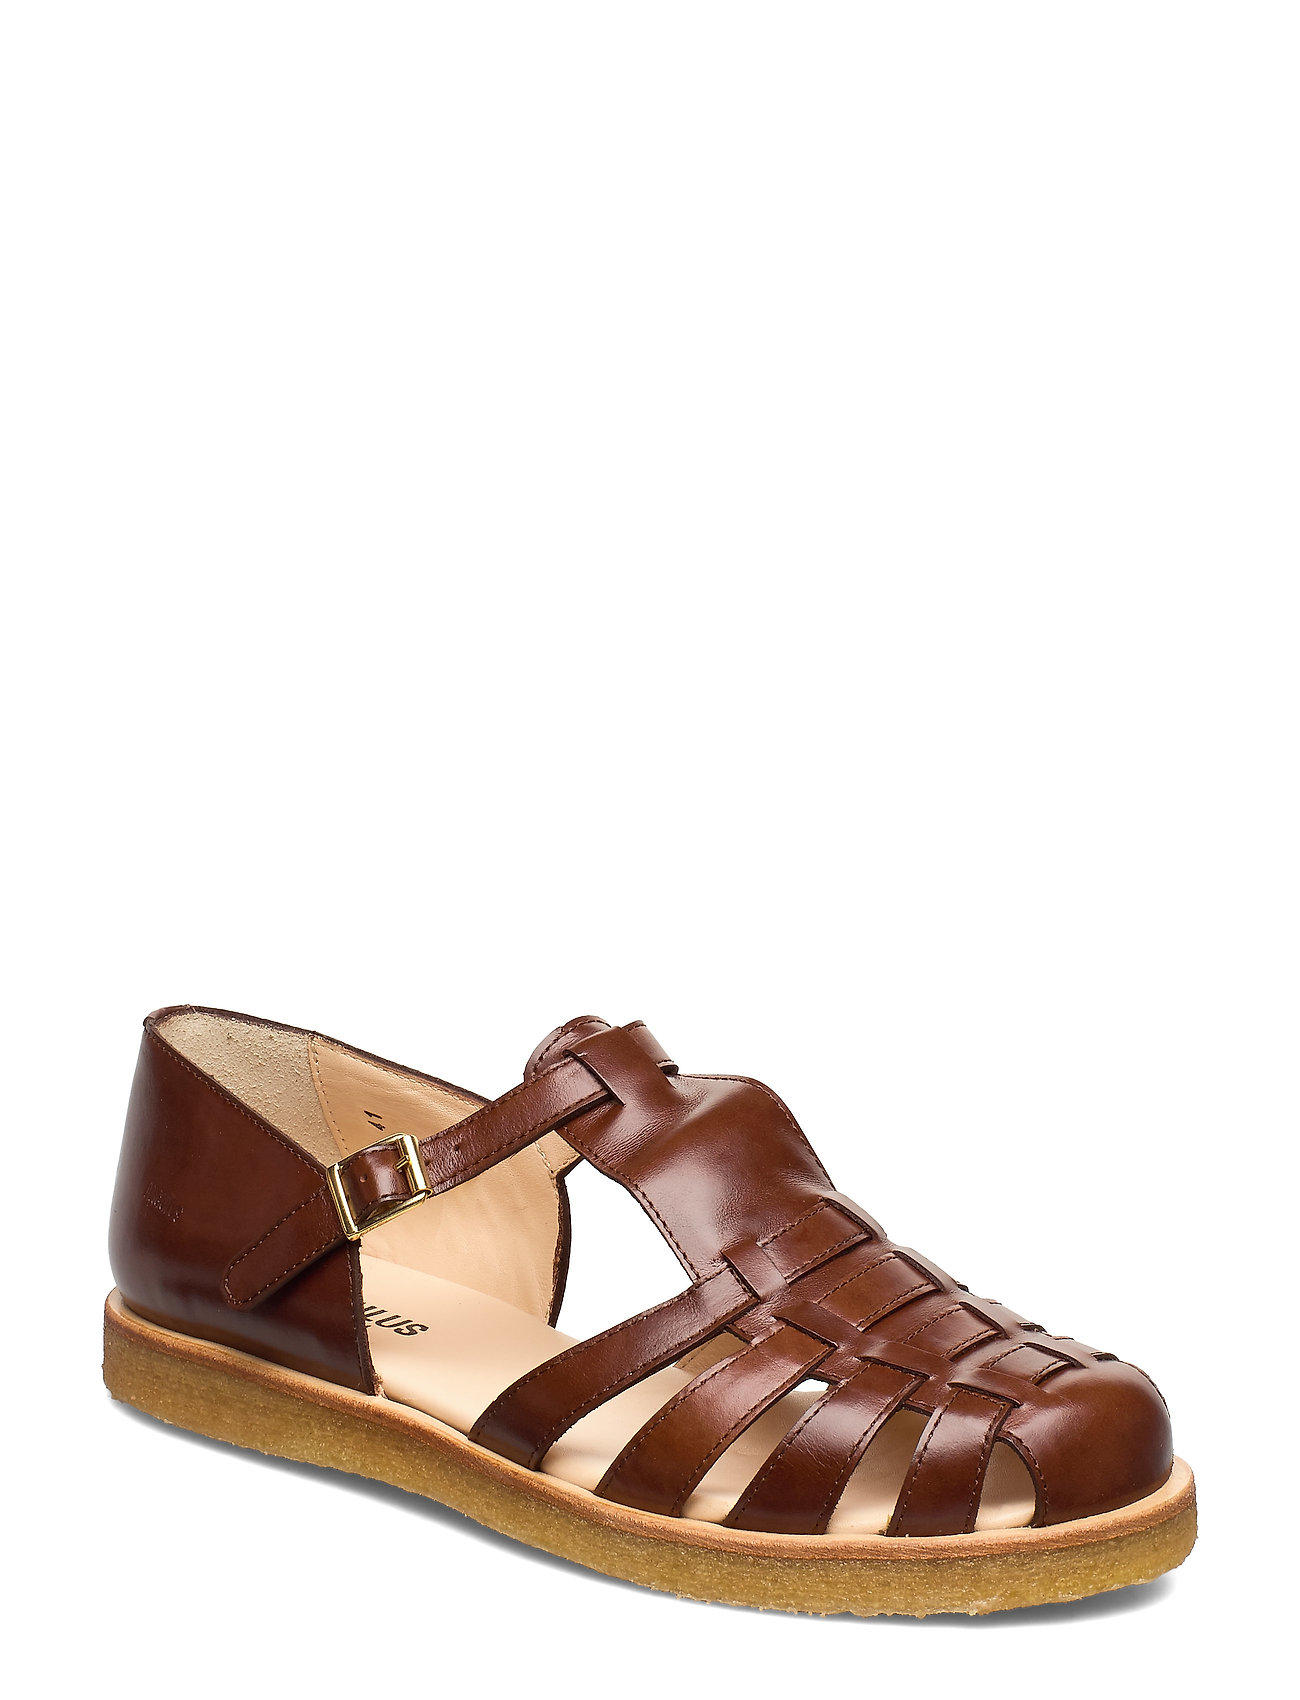 Image of Sandals - Flat - Closed Toe - Op Shoes Summer Shoes Flat Sandals Brun ANGULUS (3490037105)